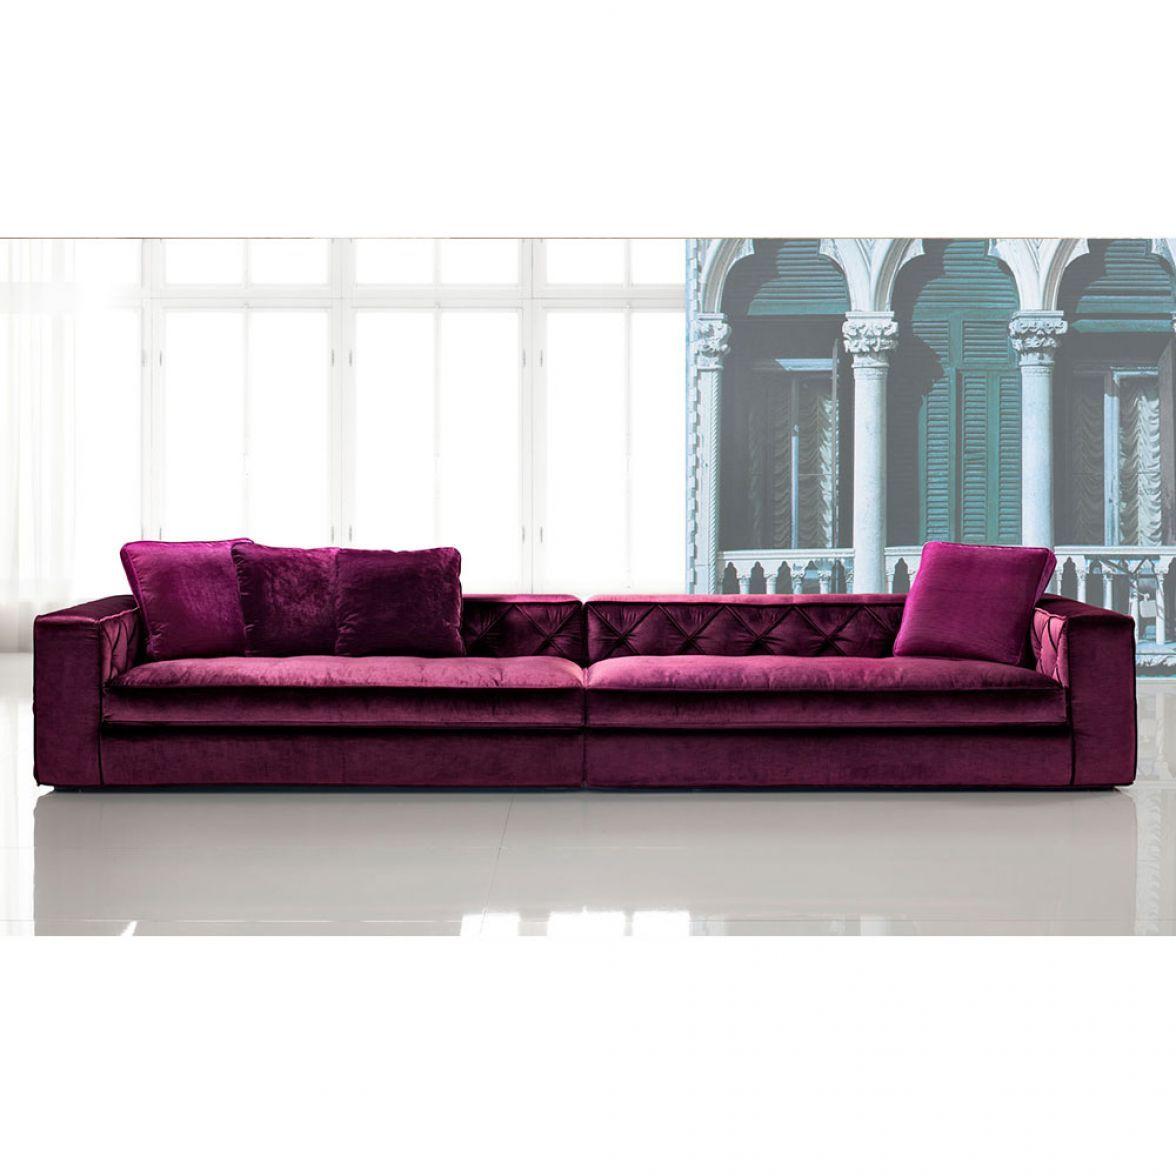 Richmond Glamour sofa